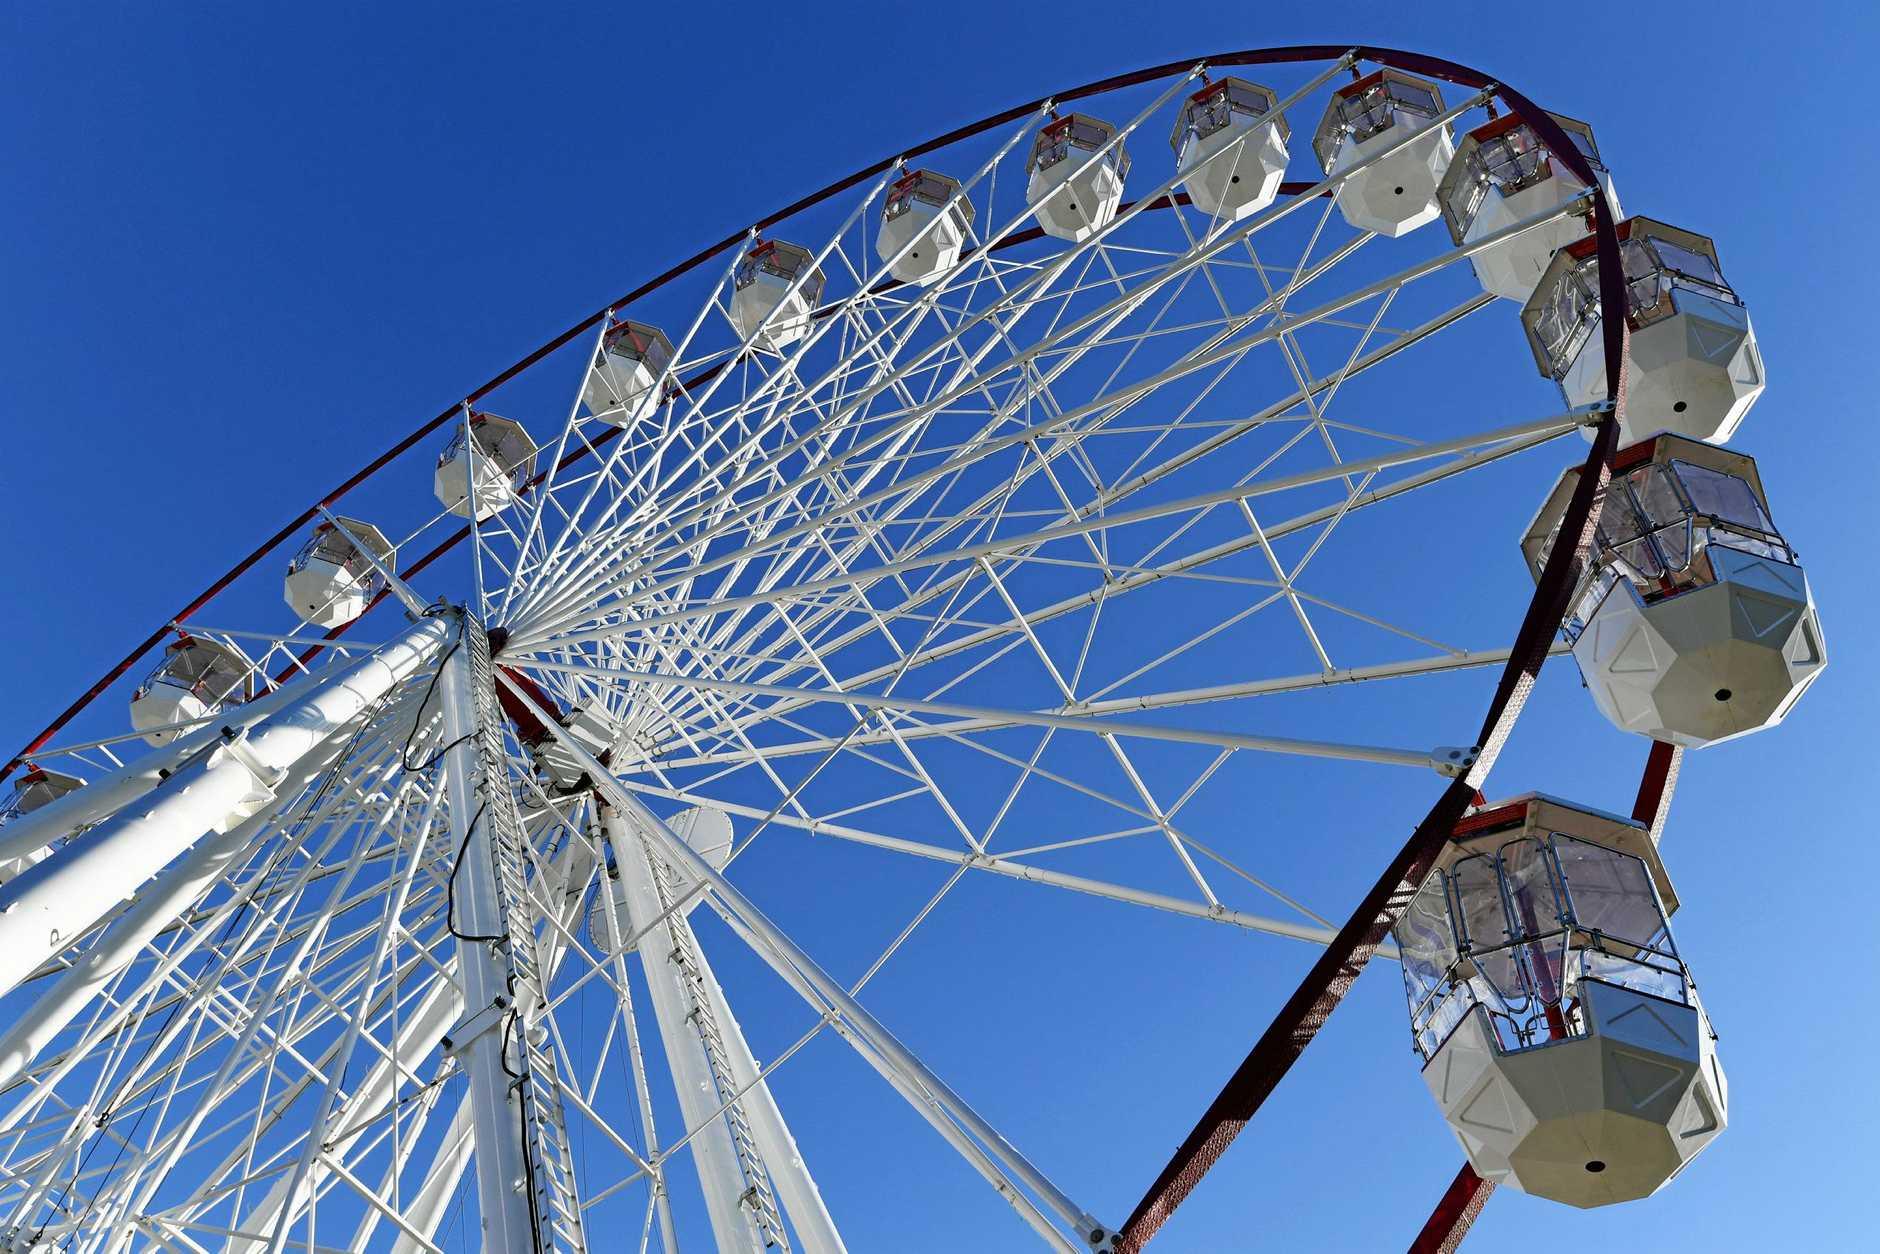 Skyline Attractions 35m ferris wheel set up on the Esplanade at Pialba.